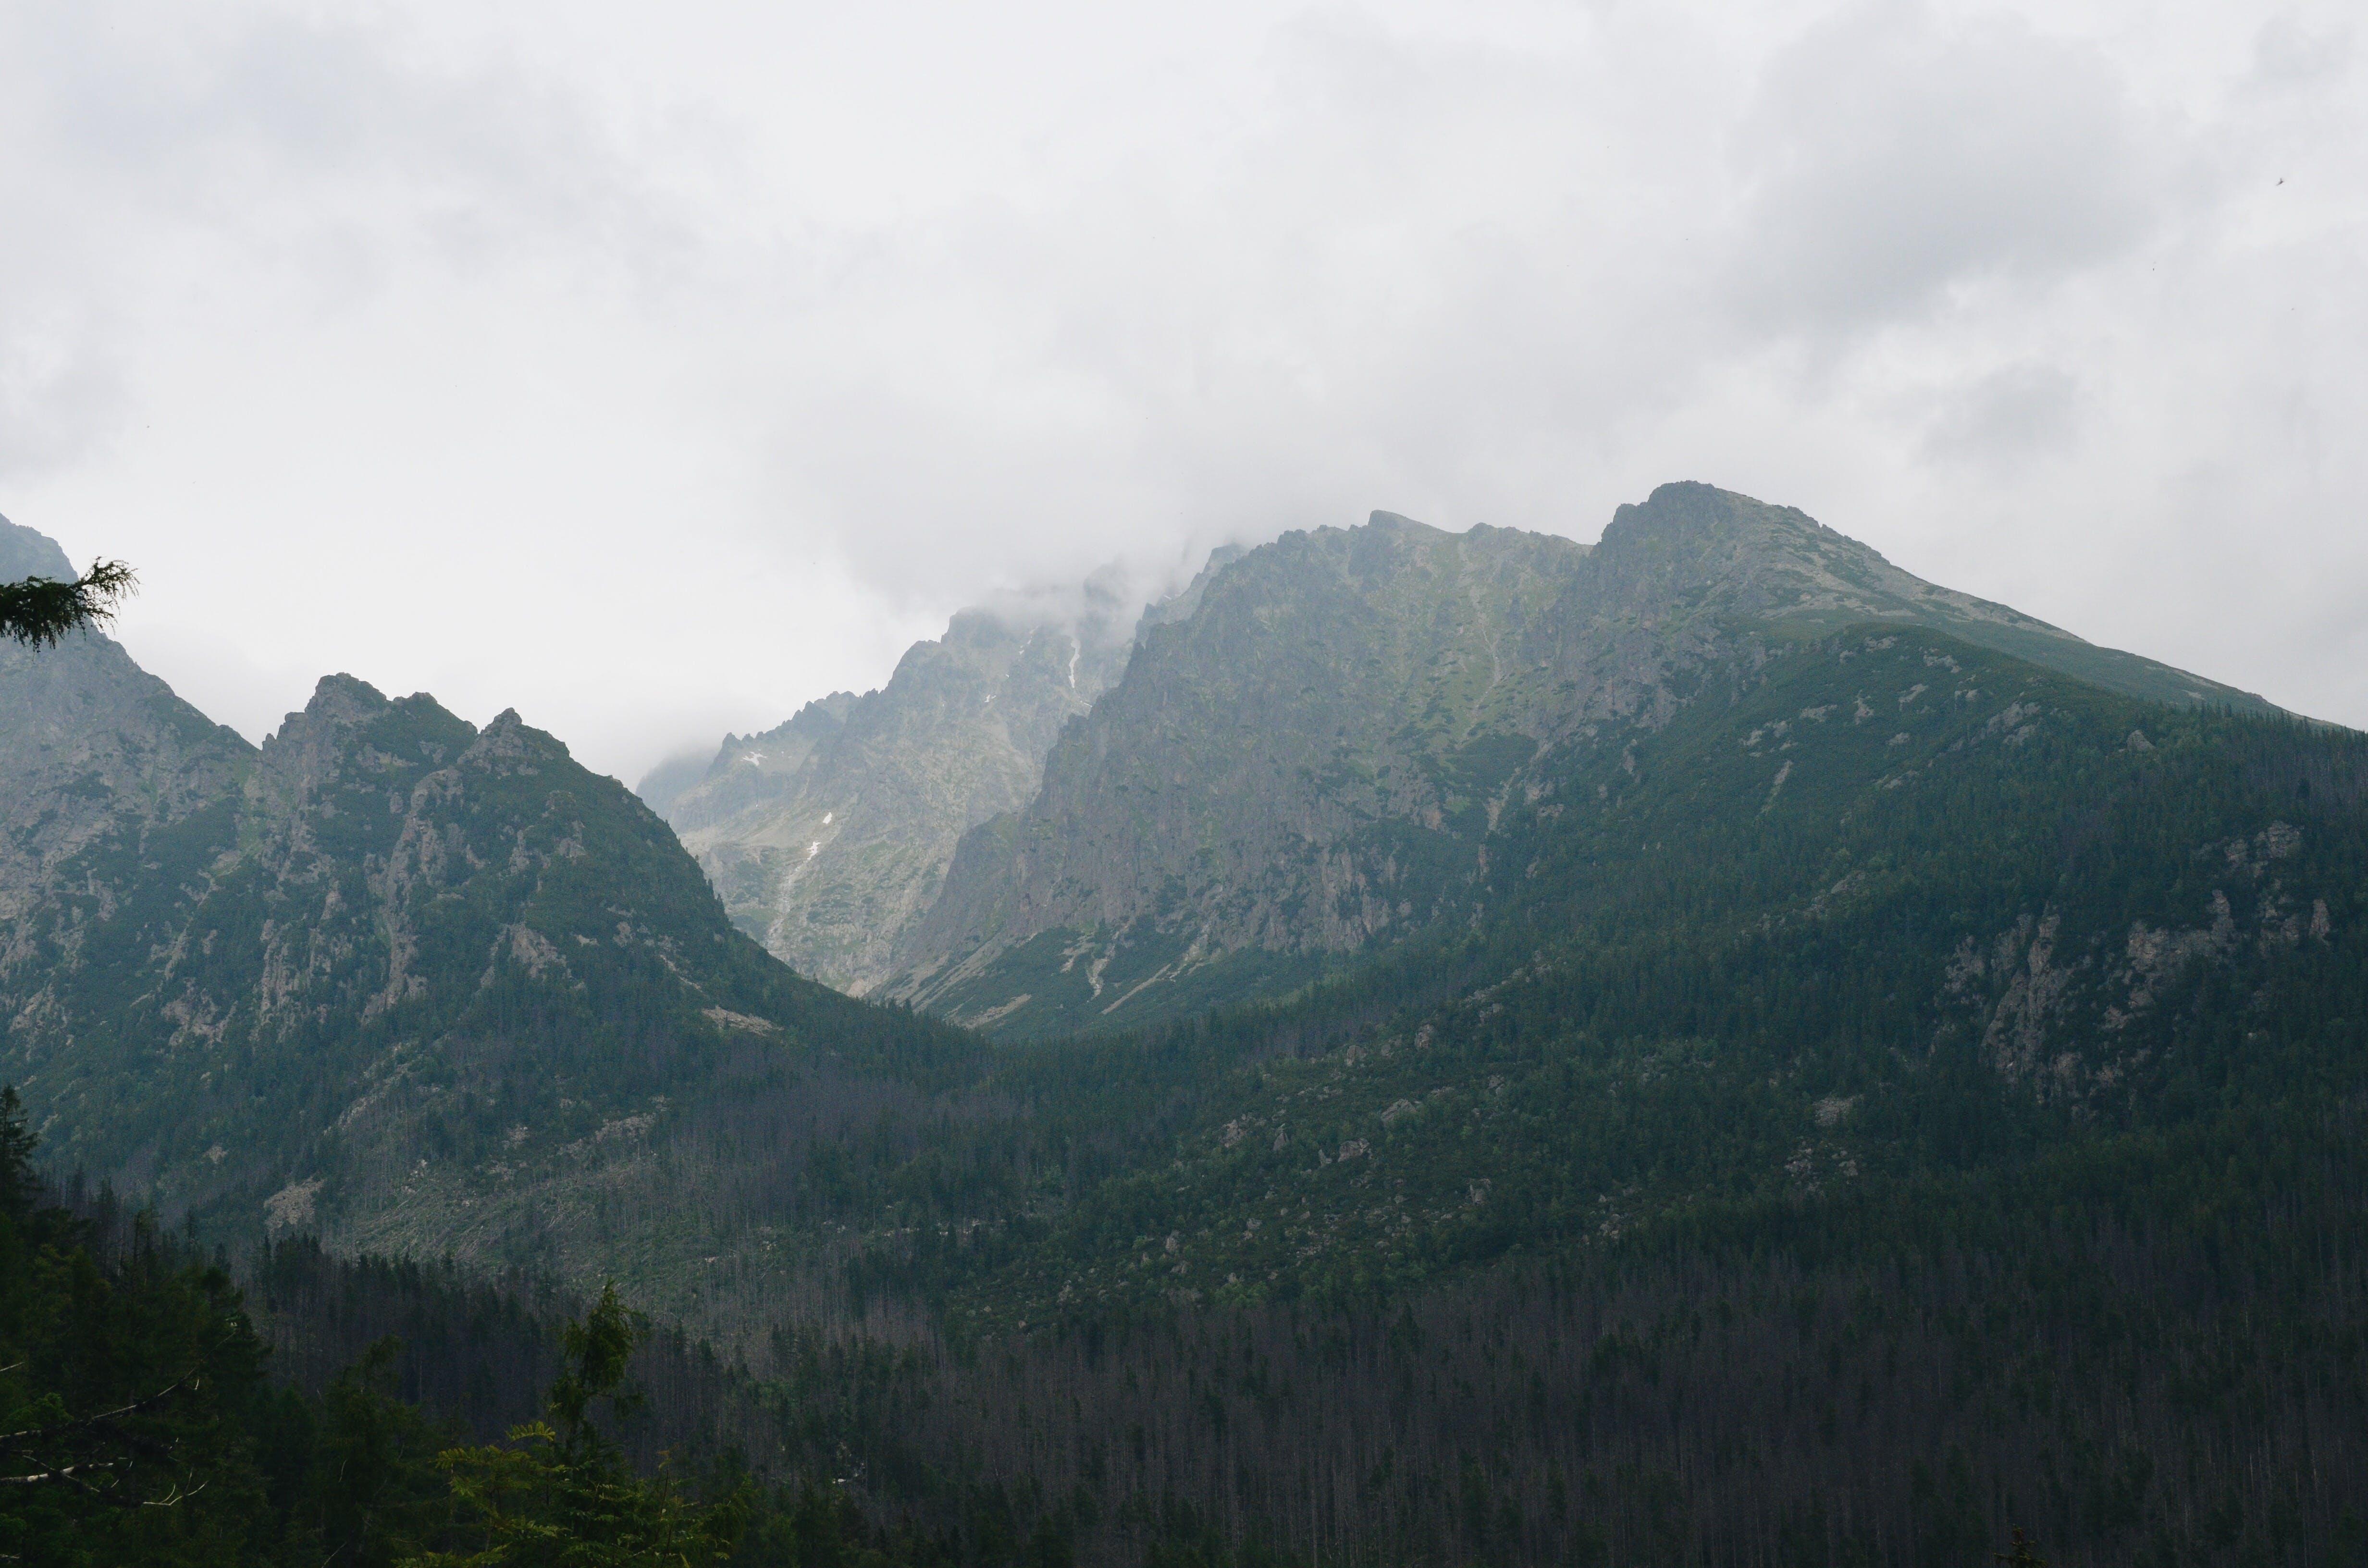 Kostenloses Stock Foto zu wolken, wald, berg, wolke